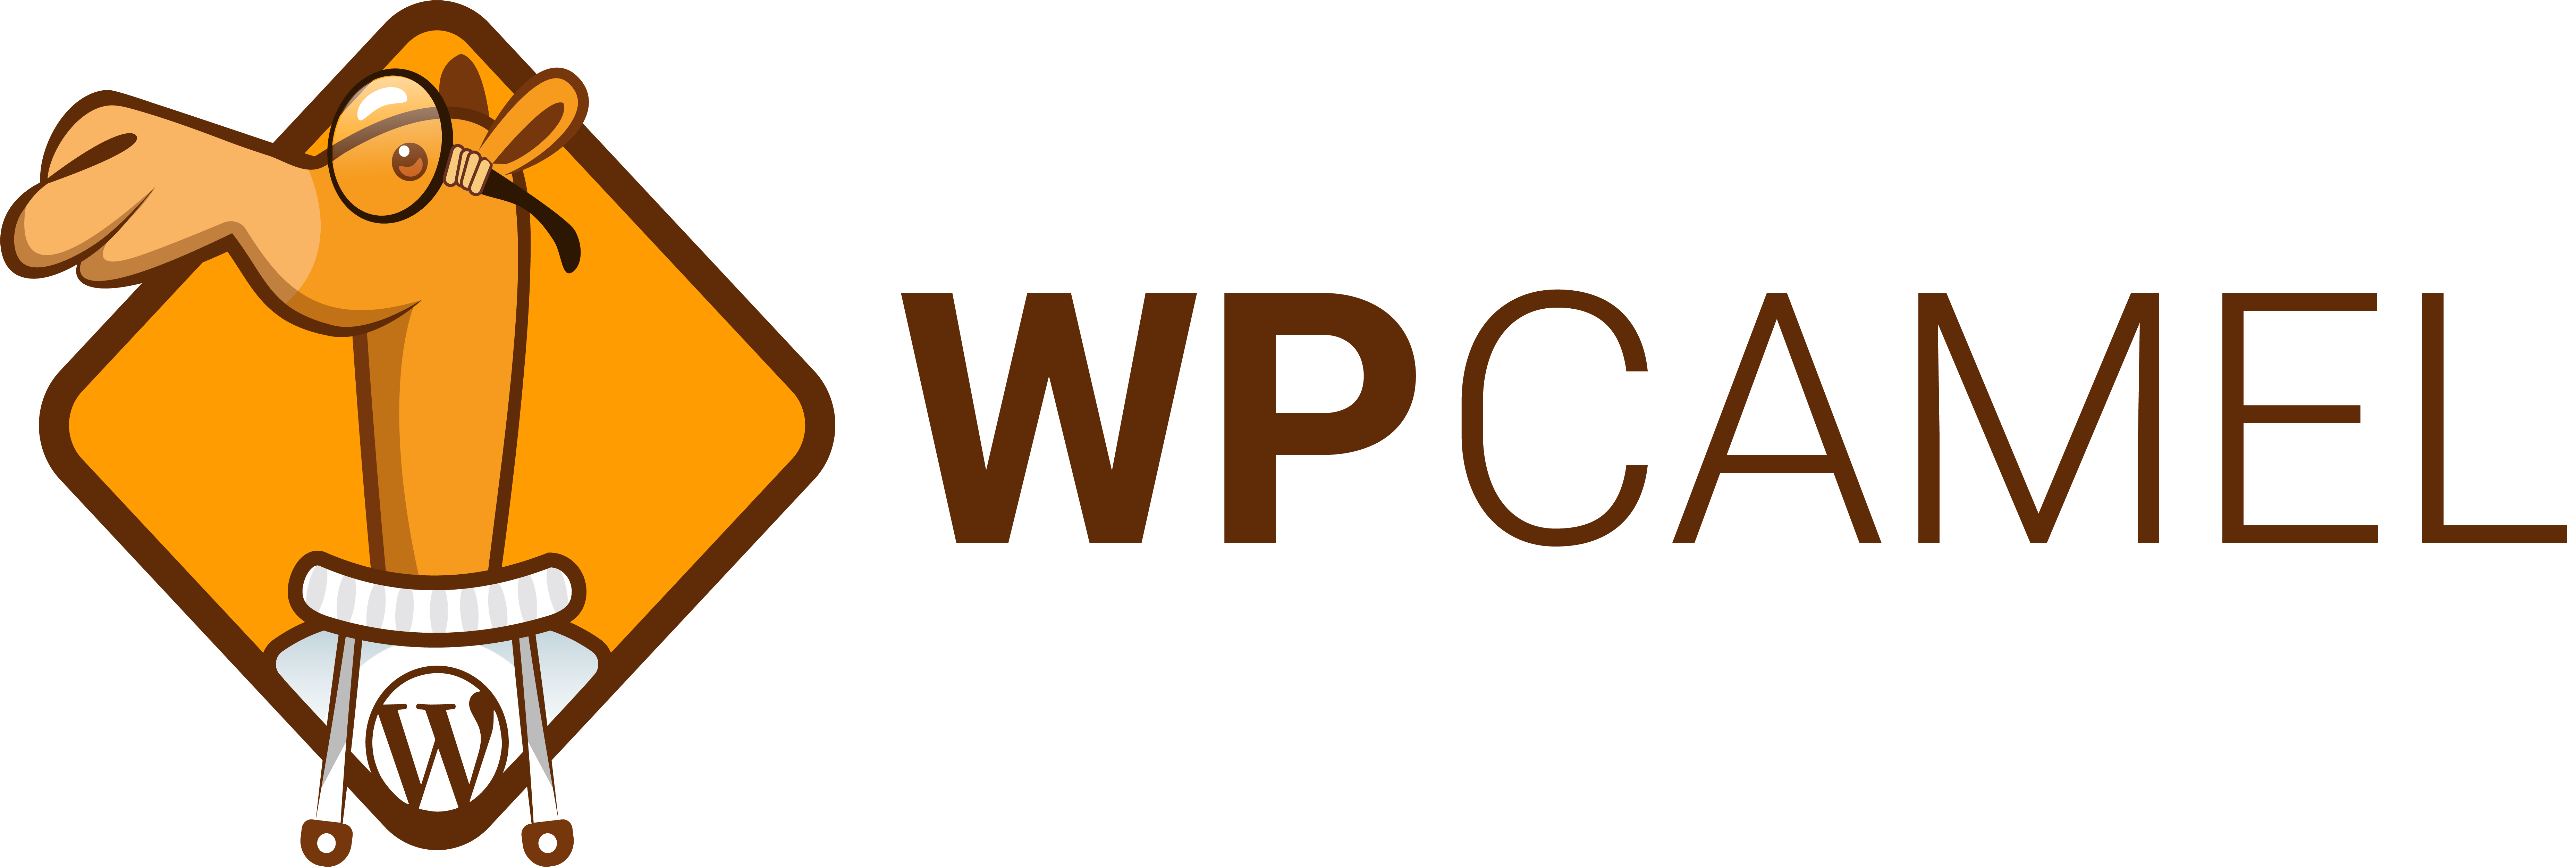 WPCamel Logo